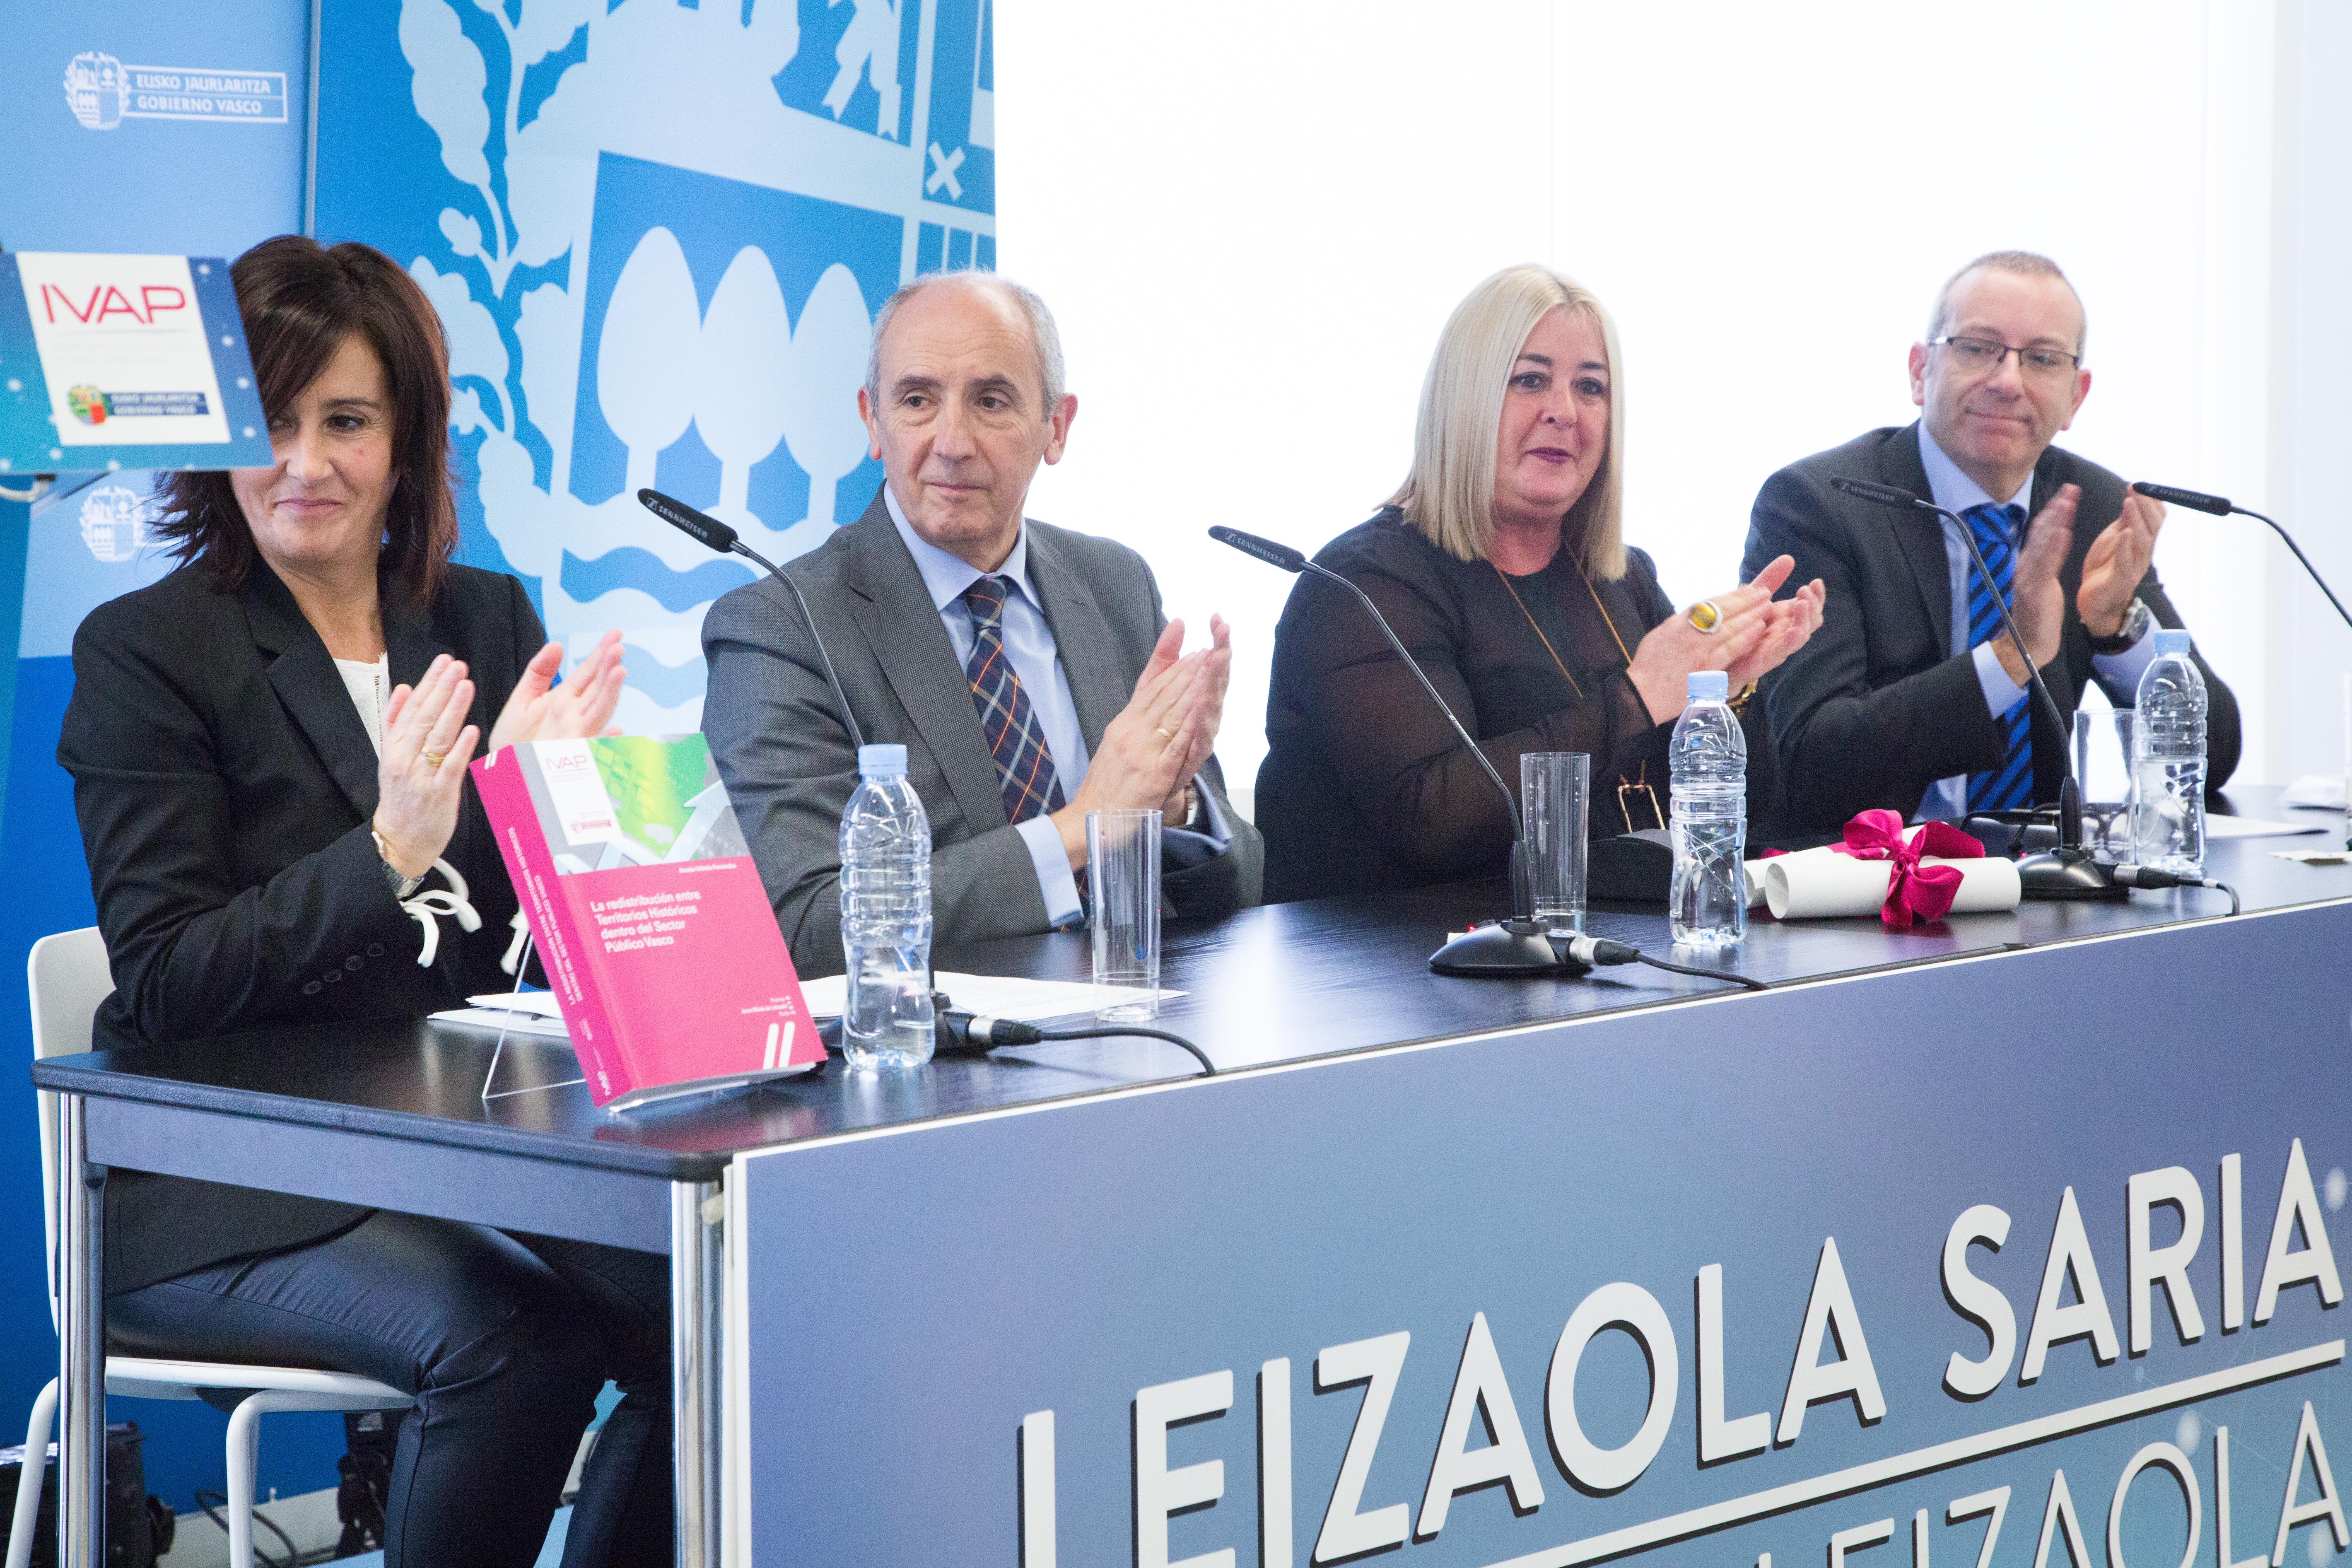 2017_12_13_premios_leizaola_16.jpg